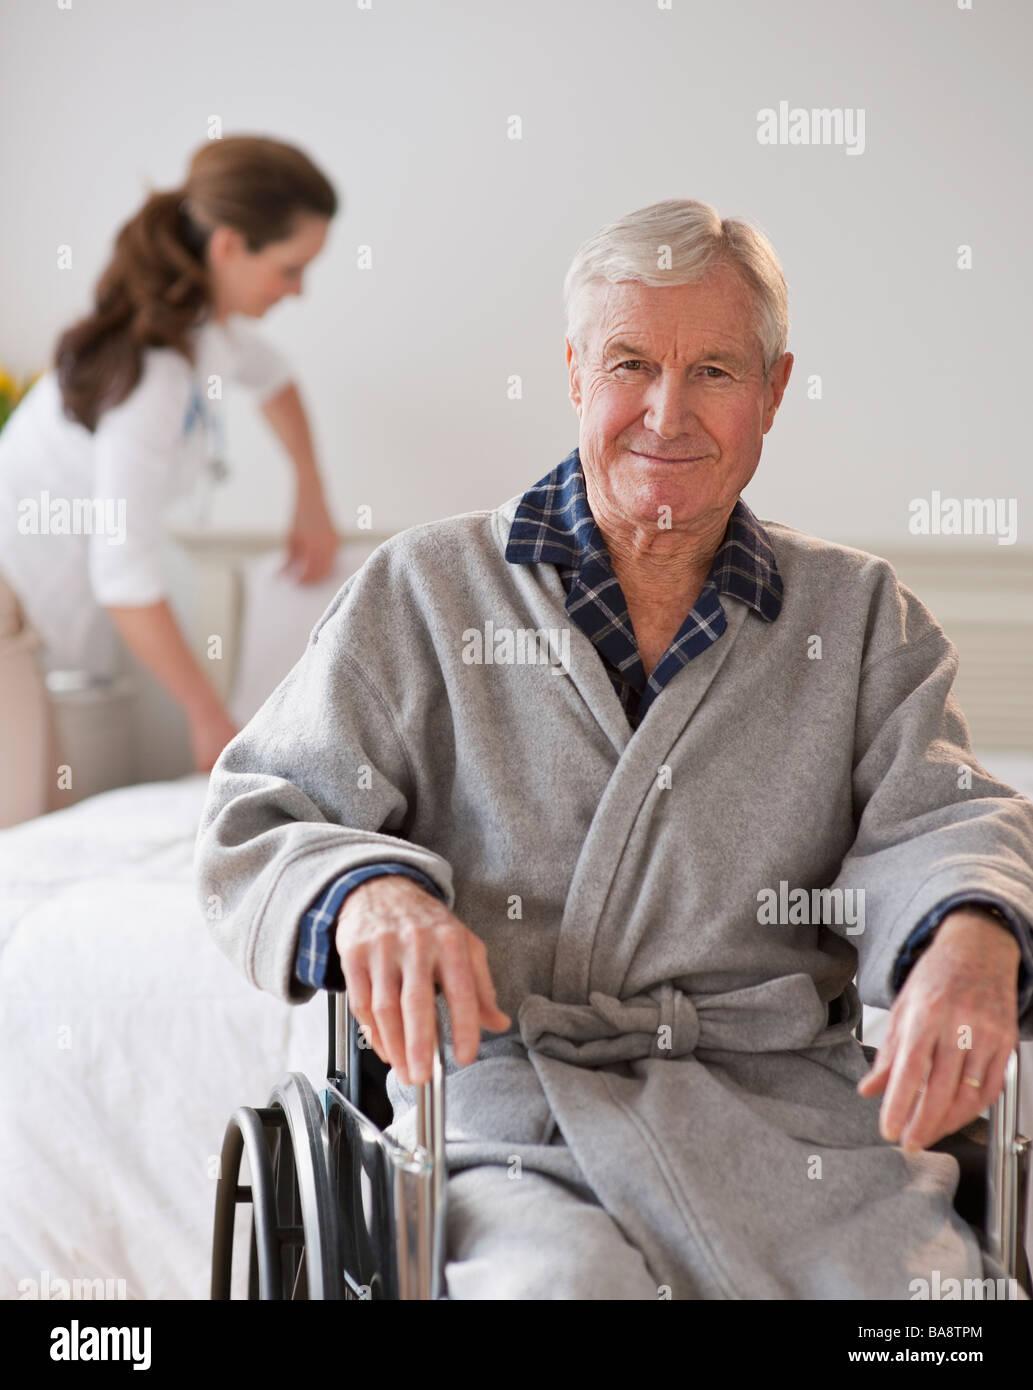 Senior man in wheel chair - Stock Image